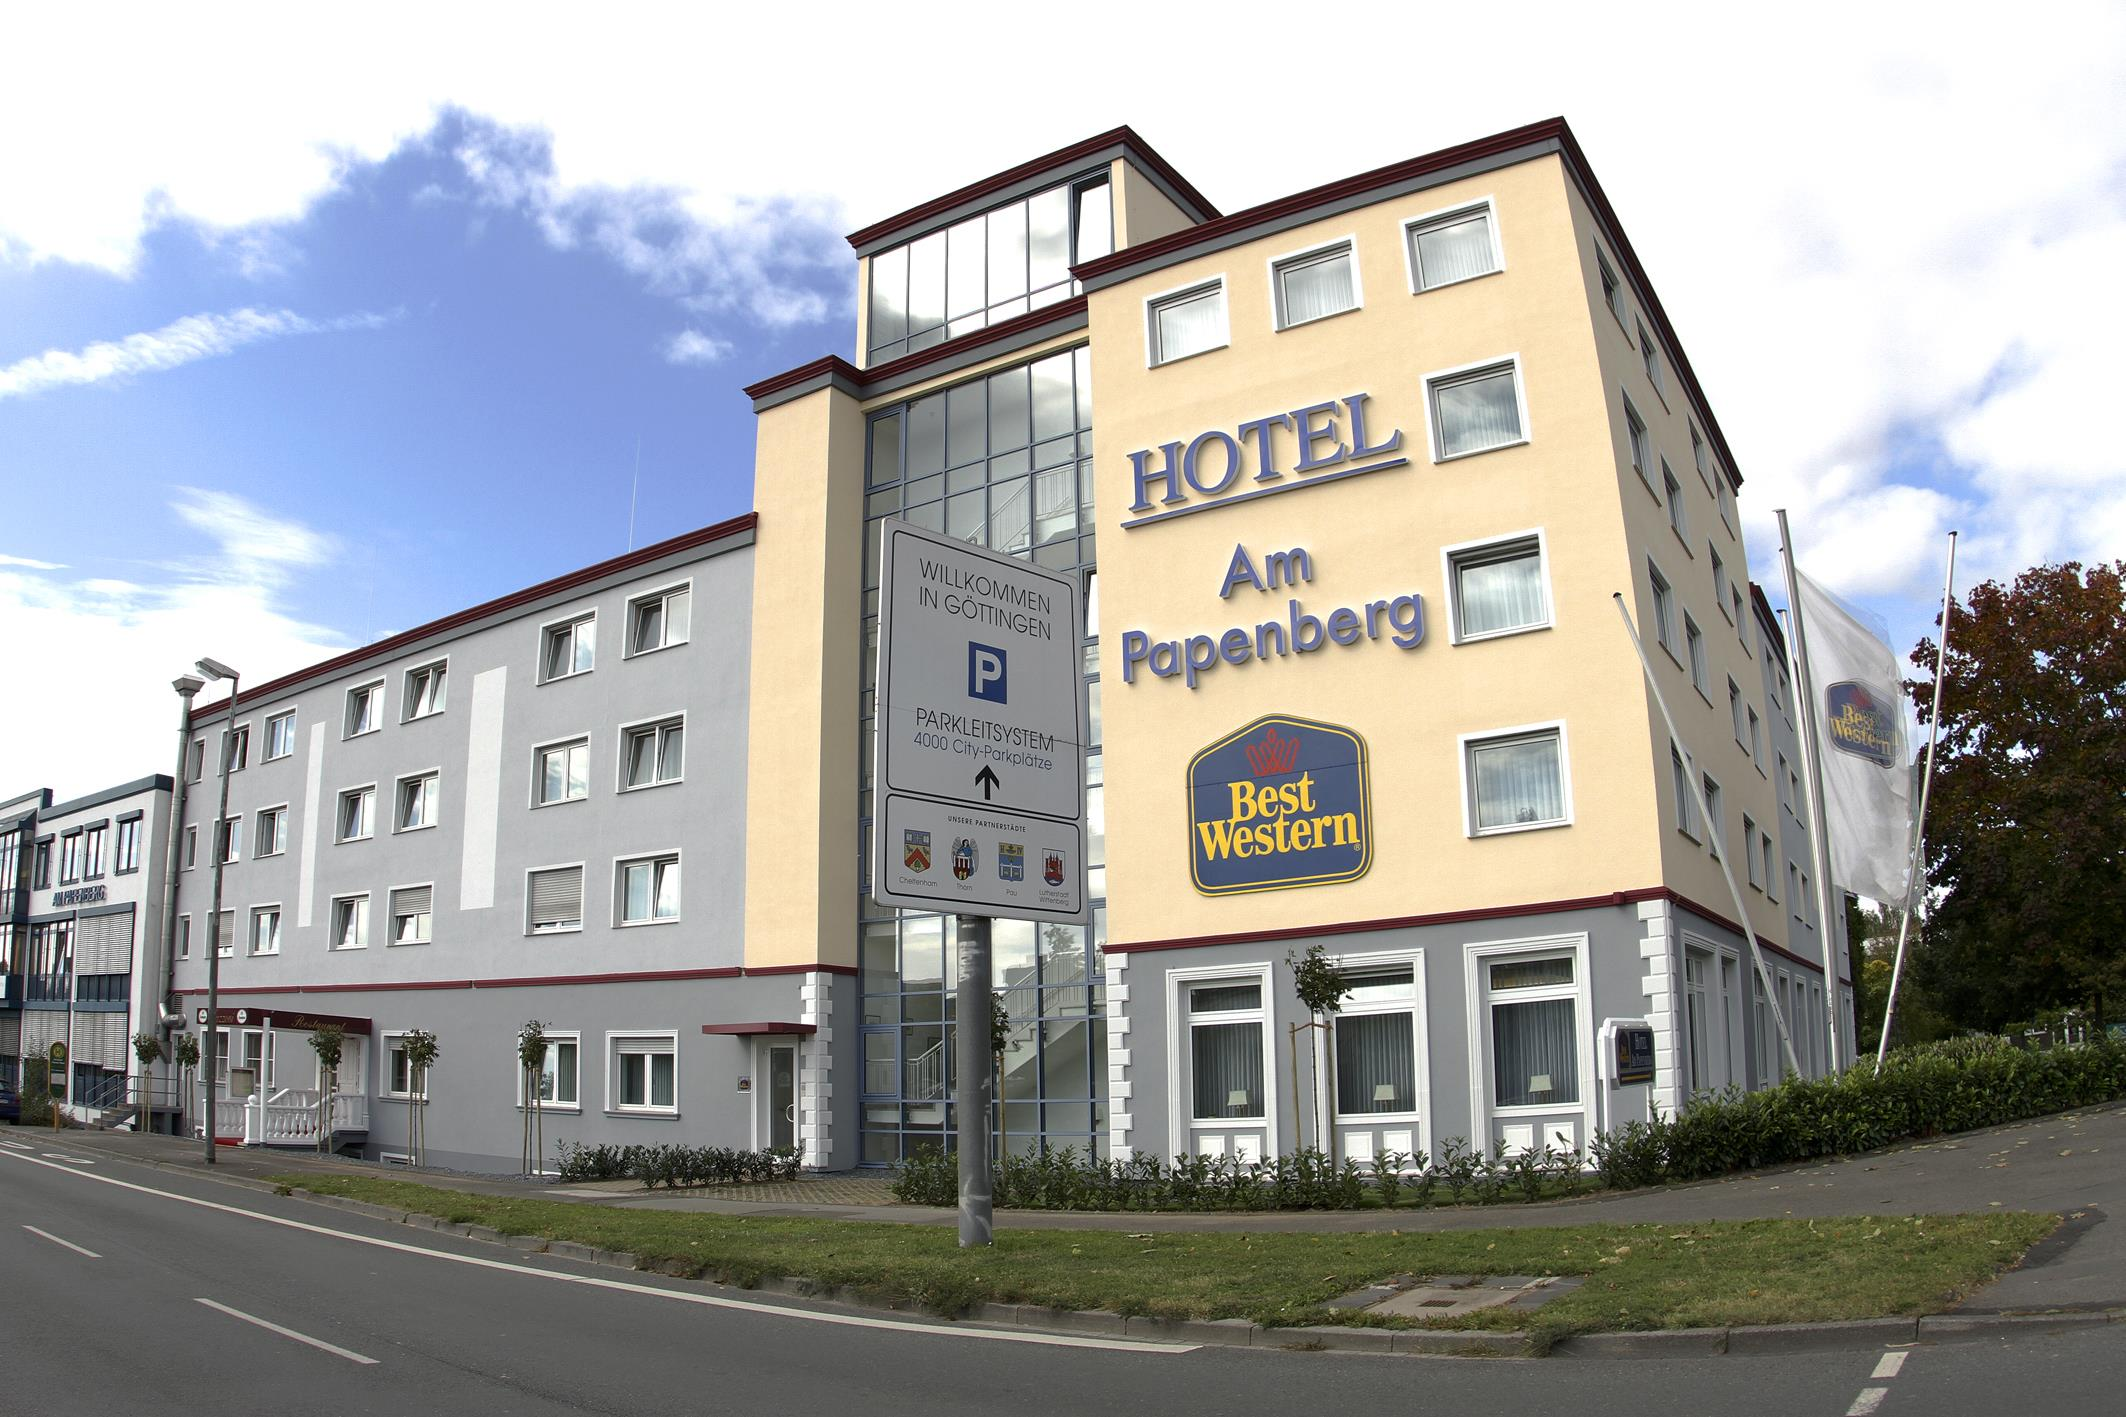 Best Western Hotel Am Papenberg Gottingen